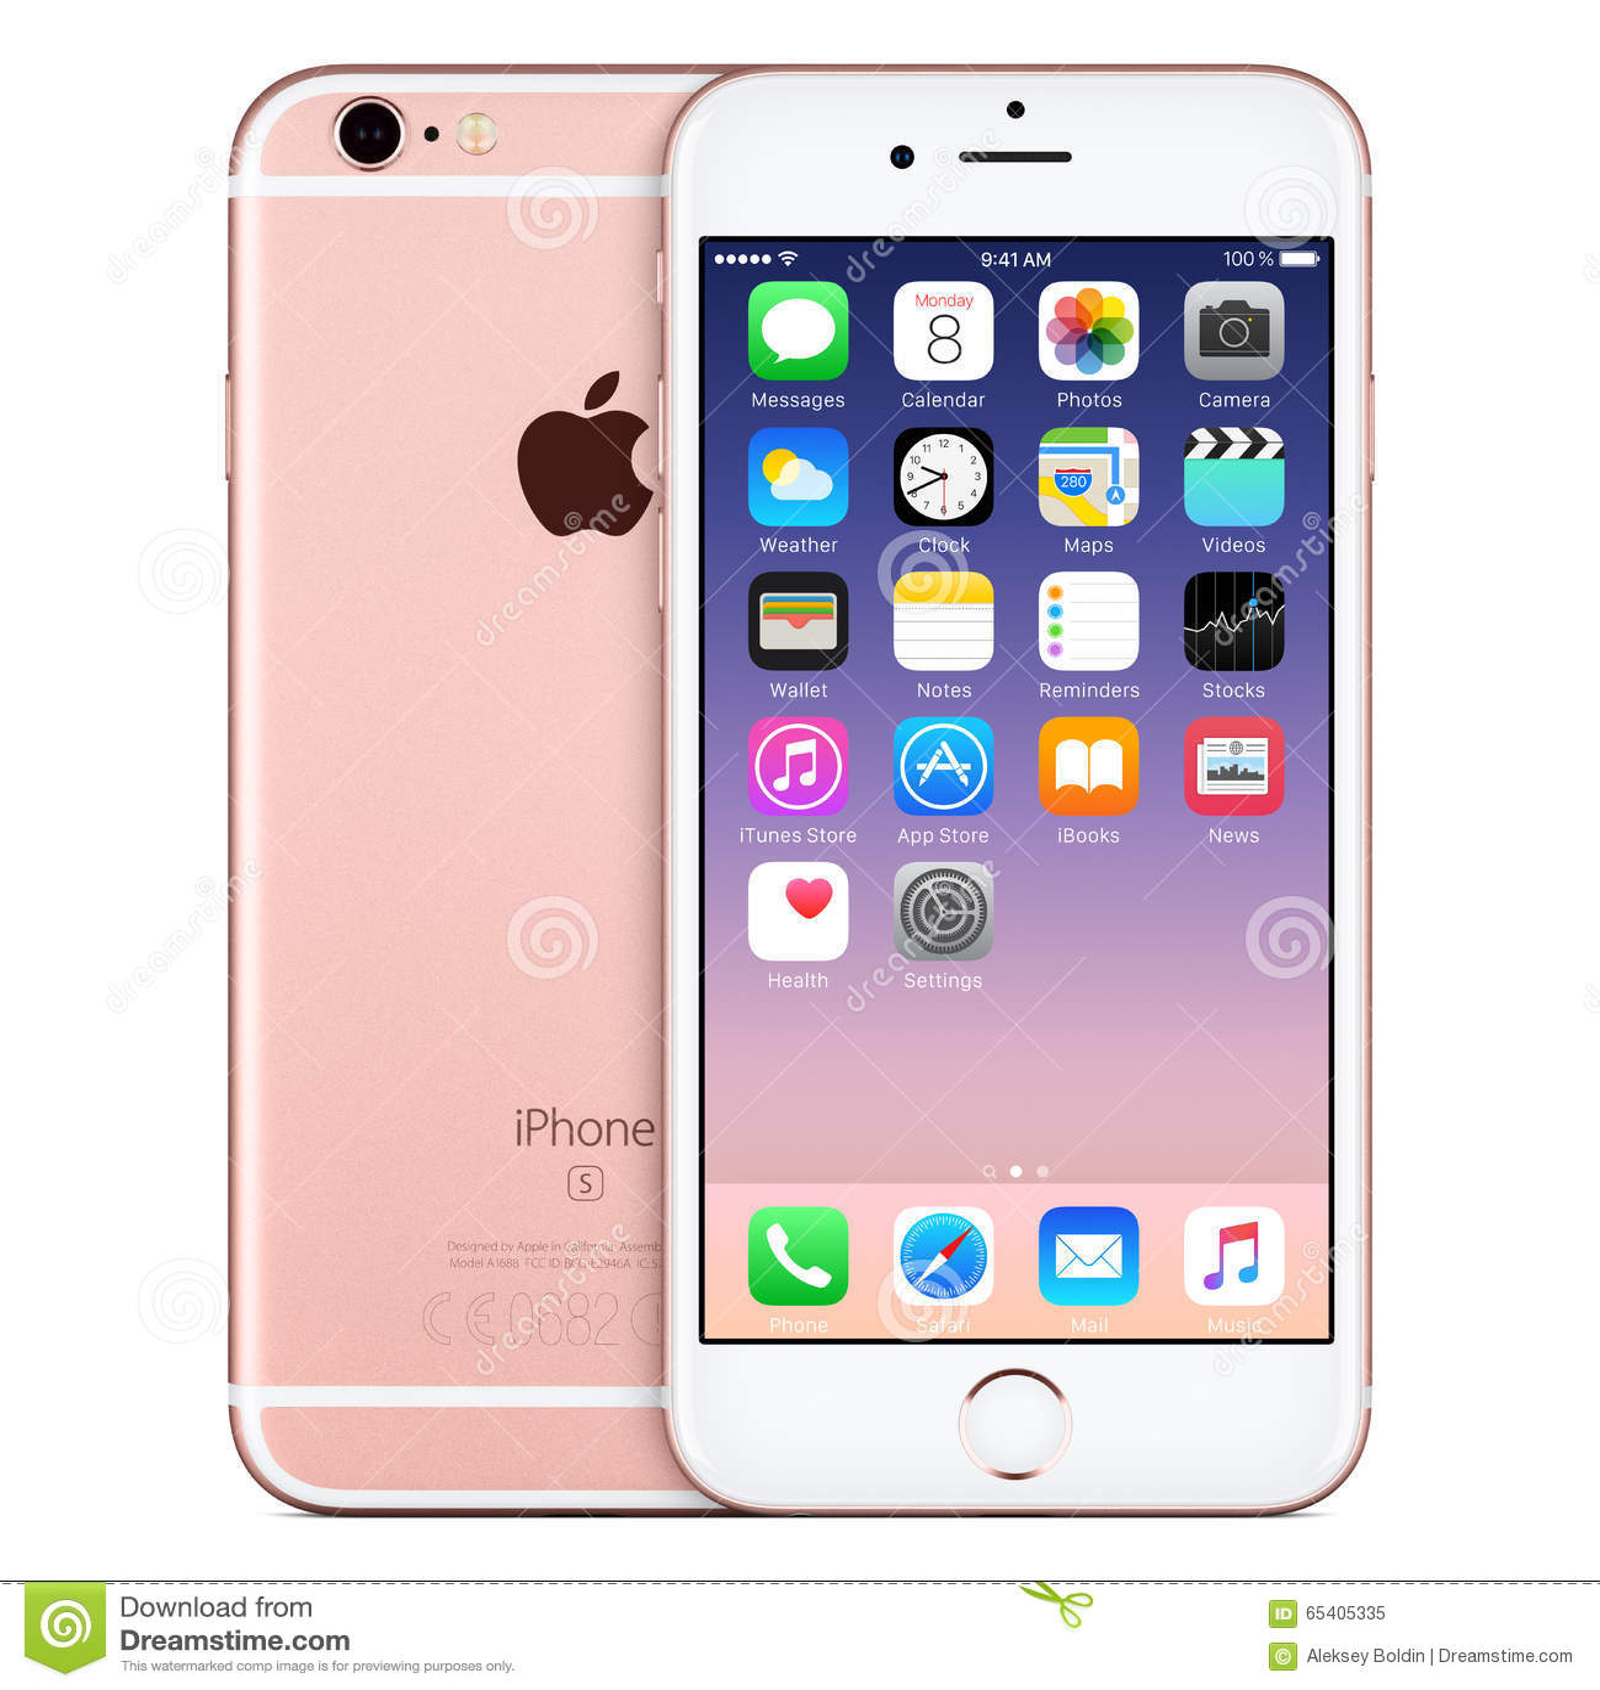 Harga Dan Spesifikasi Uncharted 4 A Thiefamp039s End Ps4 Termurah Moeszaffir Kumari Twist Lock Hand Bag Pink Ampamp Turquoise Promo Apple Iphone 6s 32gb Smartphone Rose Gold 2018